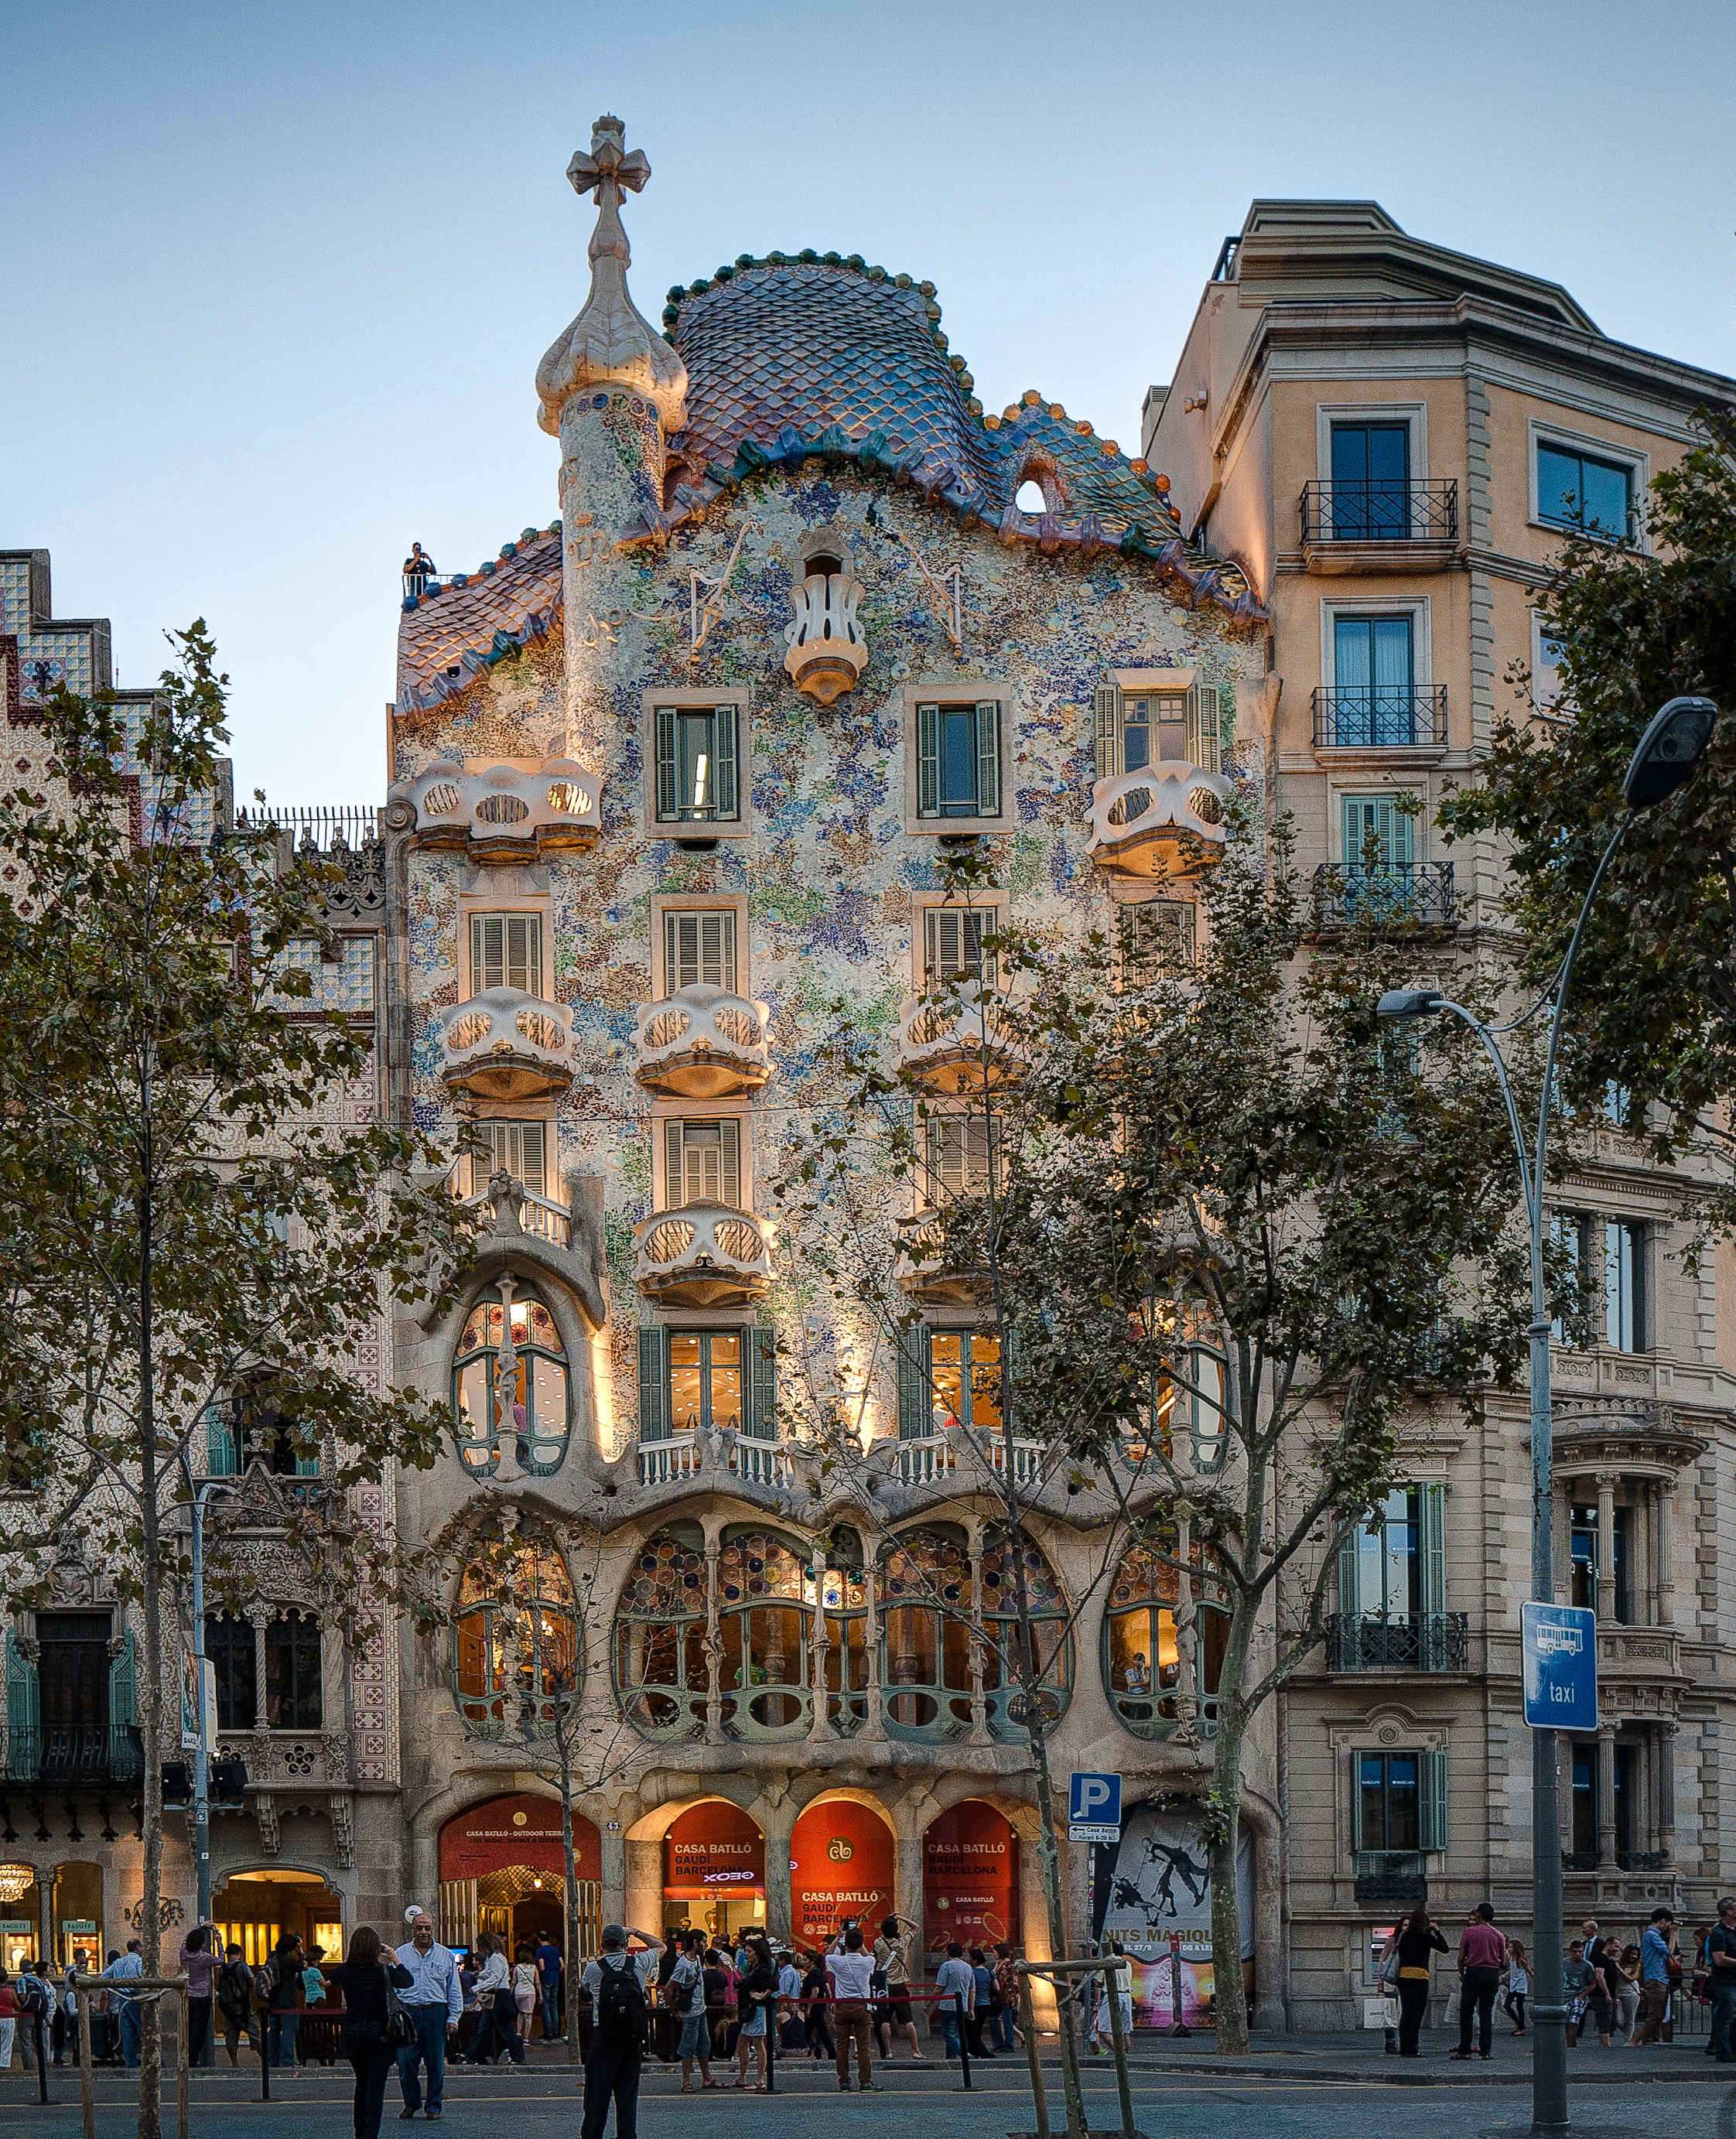 Casa_Batllo_Overview_Barcelona_Spain_cut